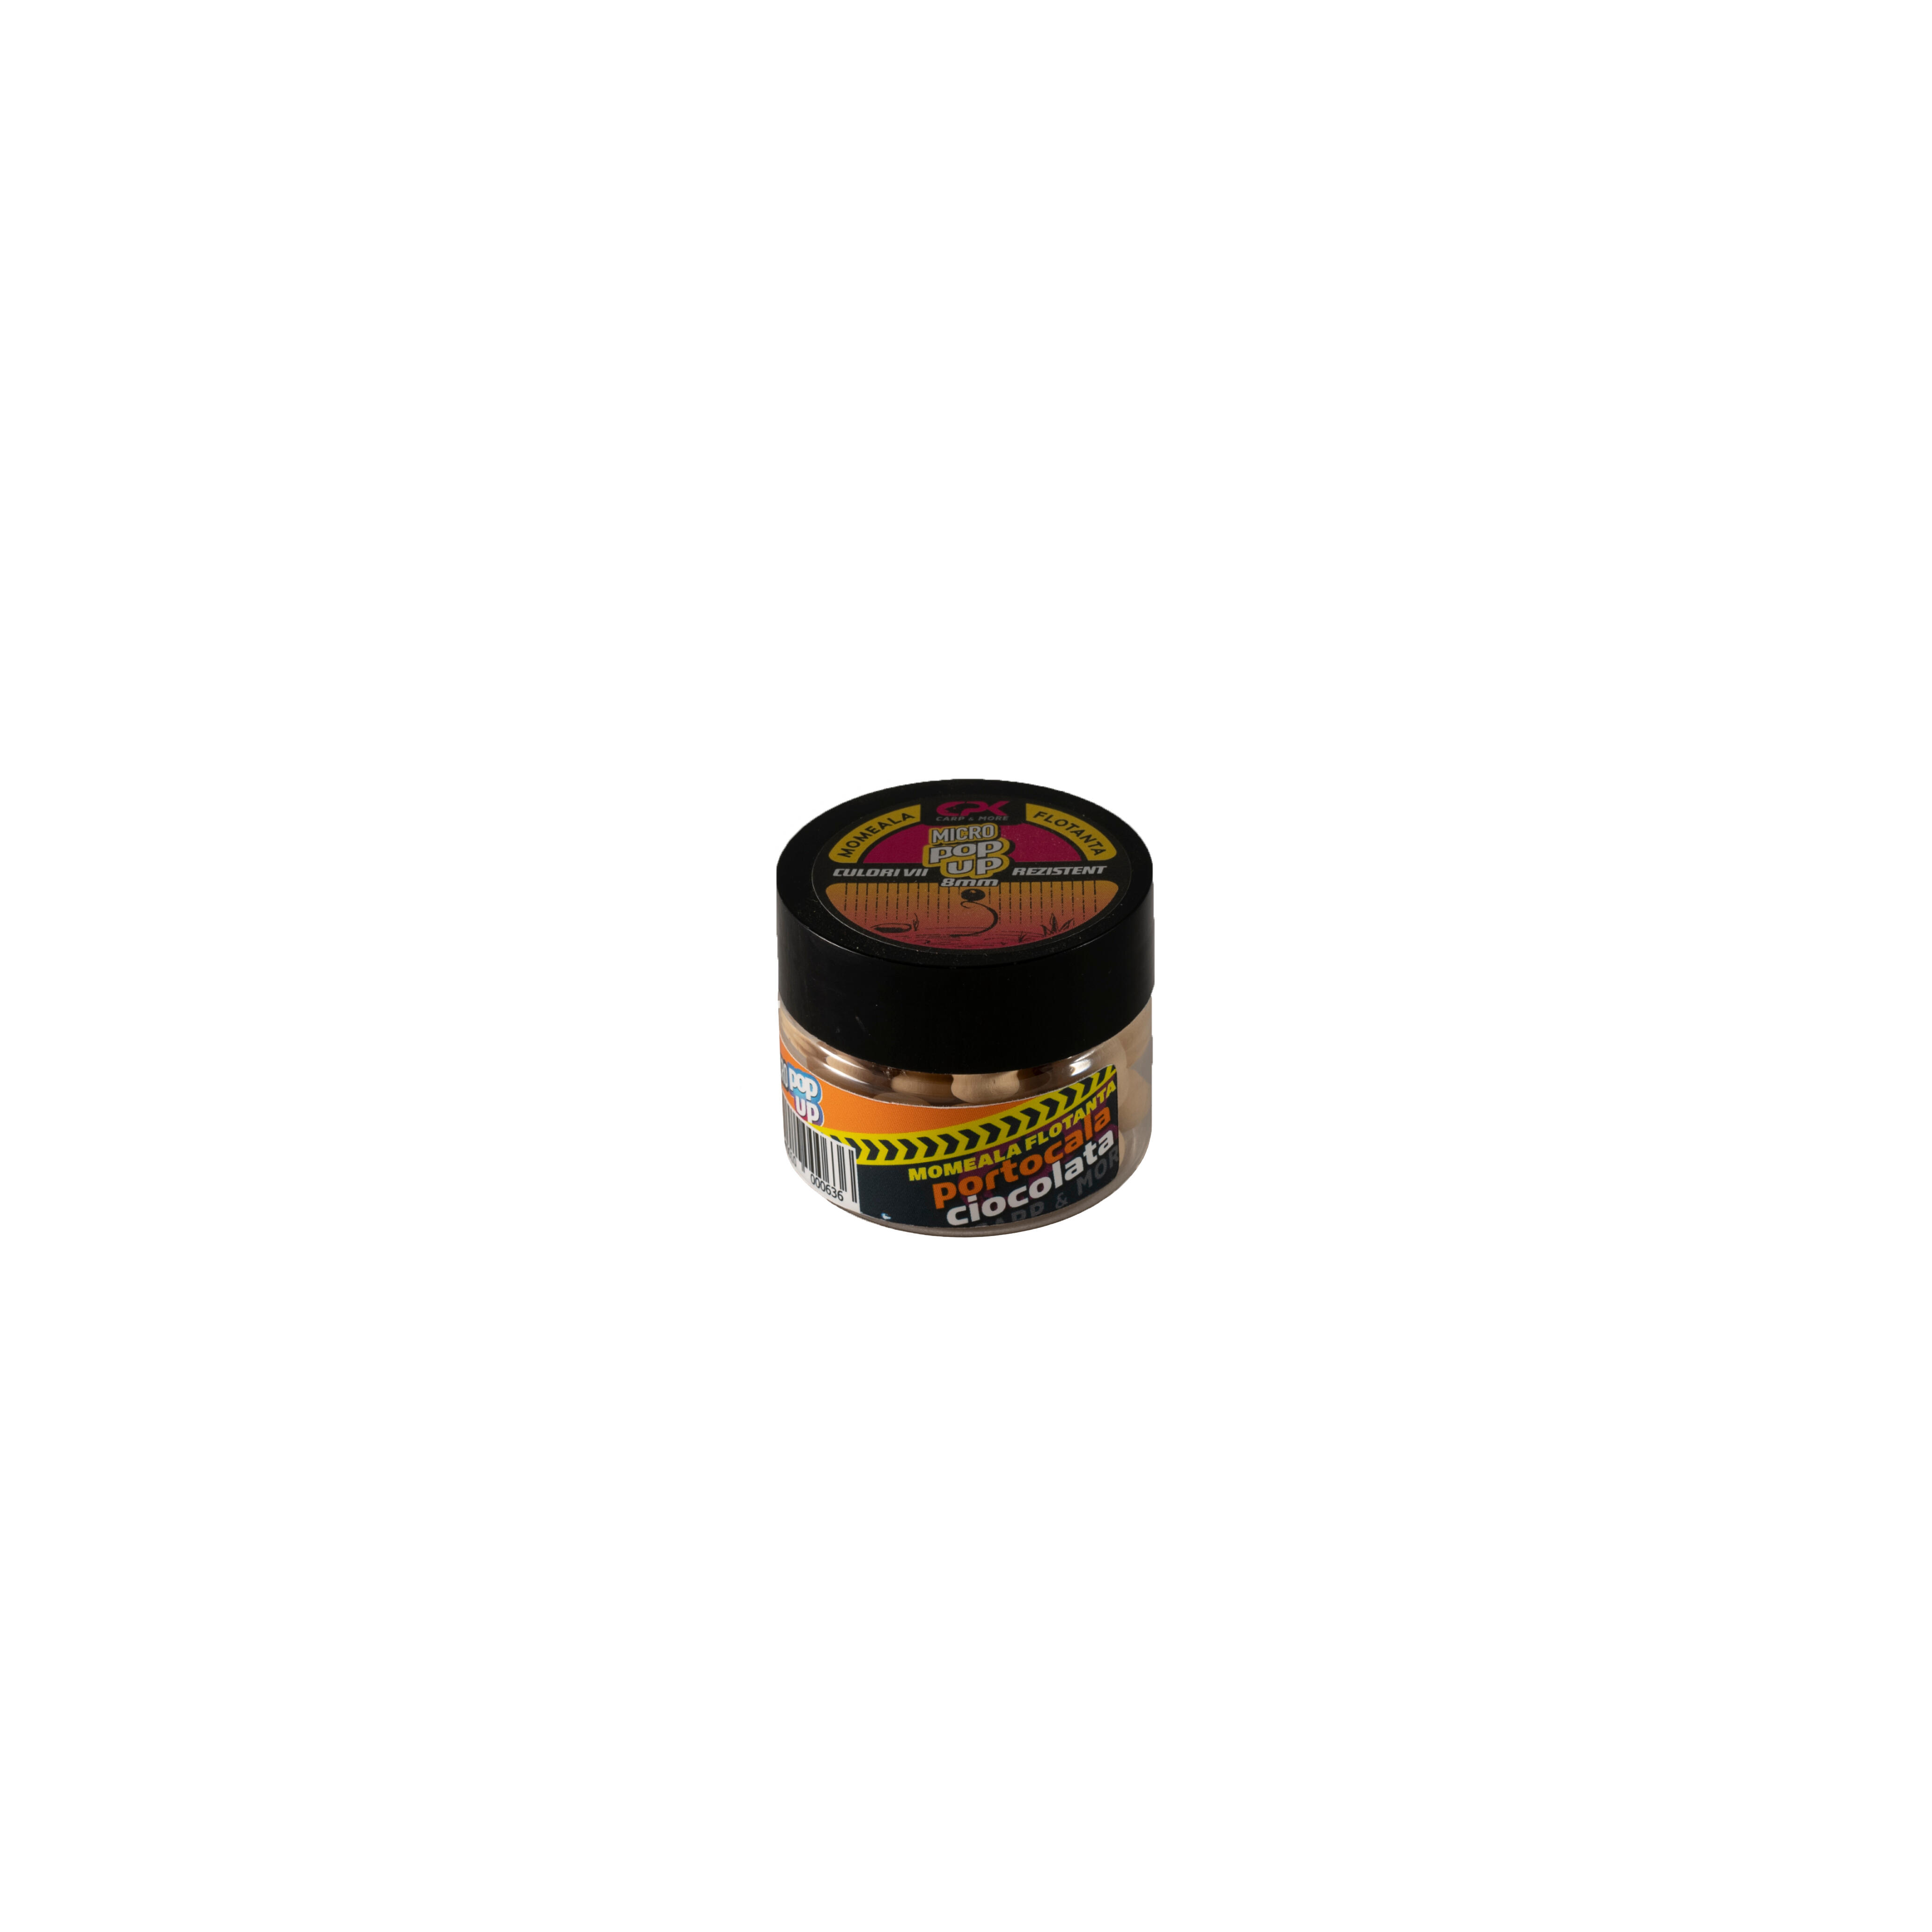 RO Micro Pop-up Portocala & Ci imagine produs